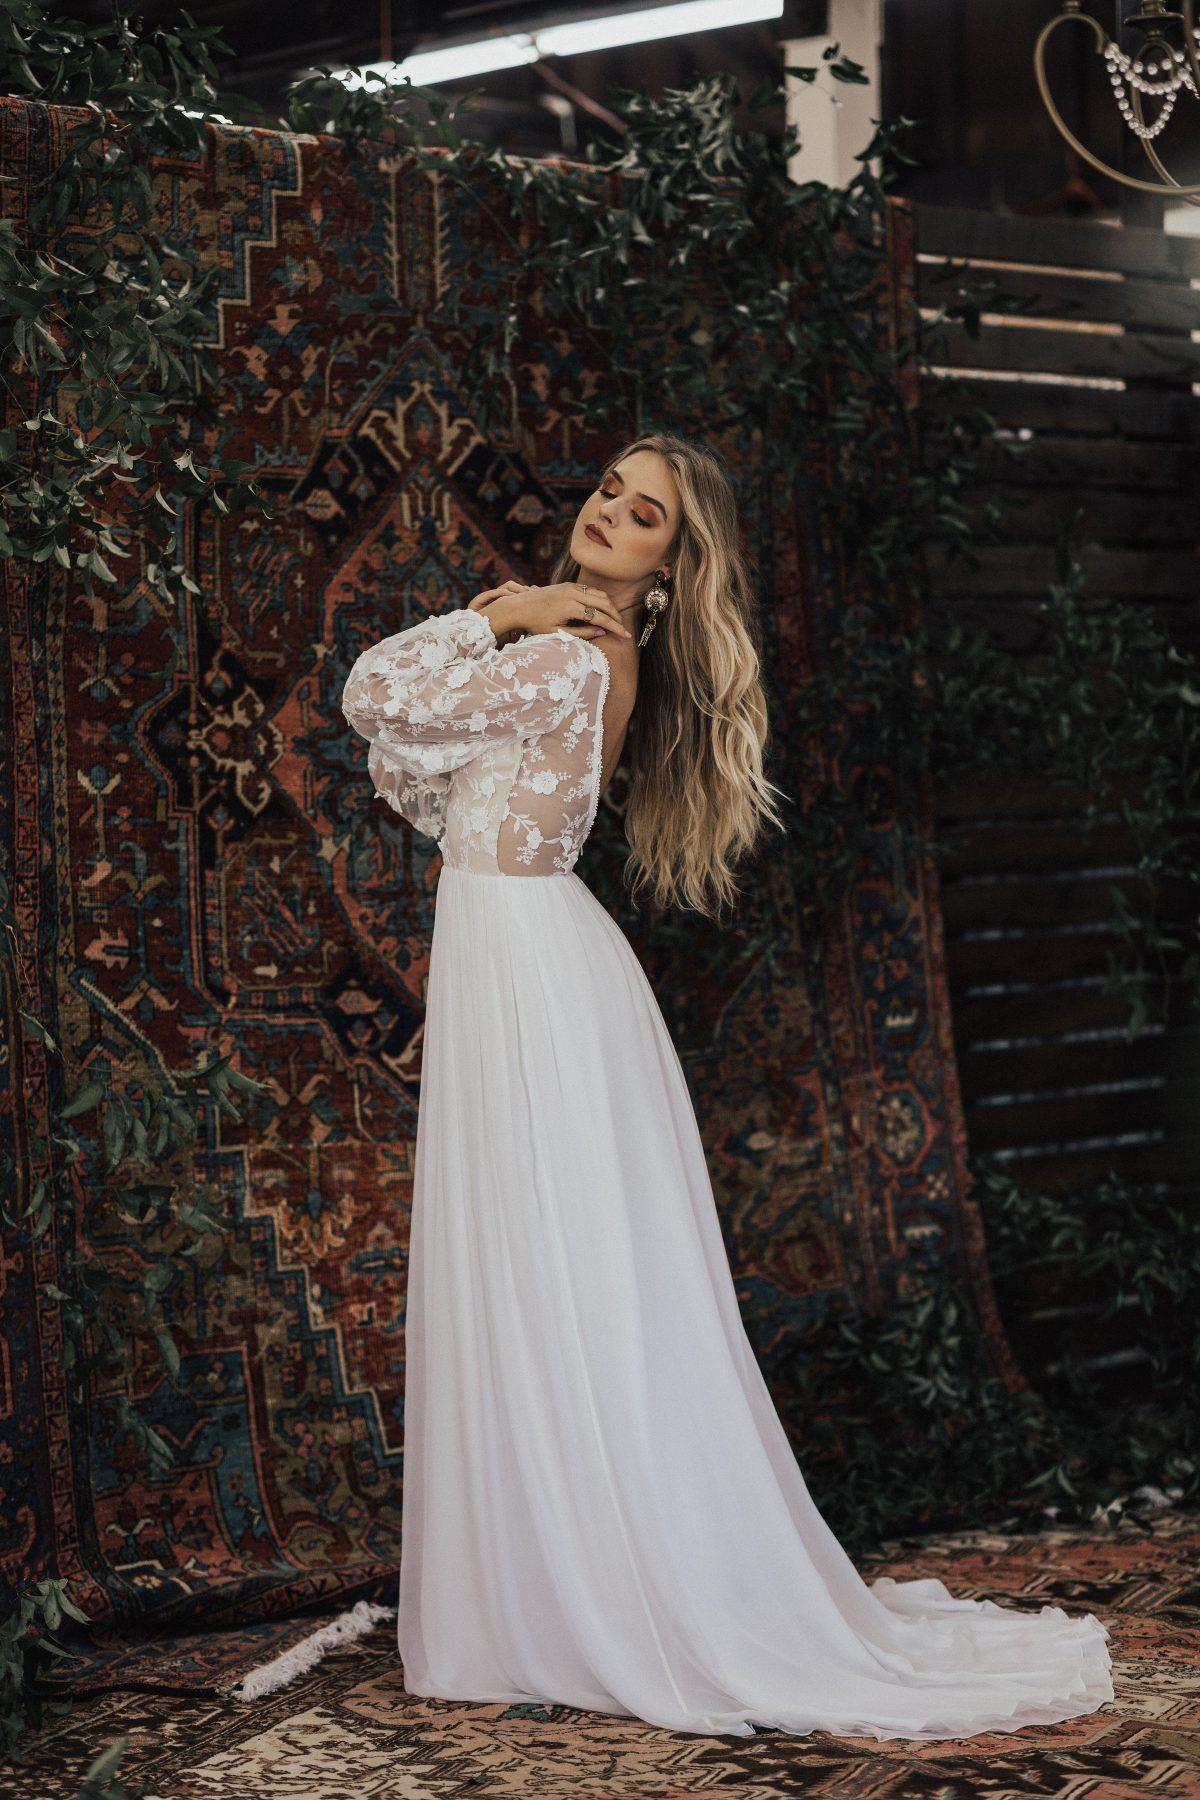 Yaya Lace And Silk Wedding Dress Green Wedding Dresses Blue Wedding Guest Dresses Silk Chiffon Wedding Dress [ 1800 x 1200 Pixel ]